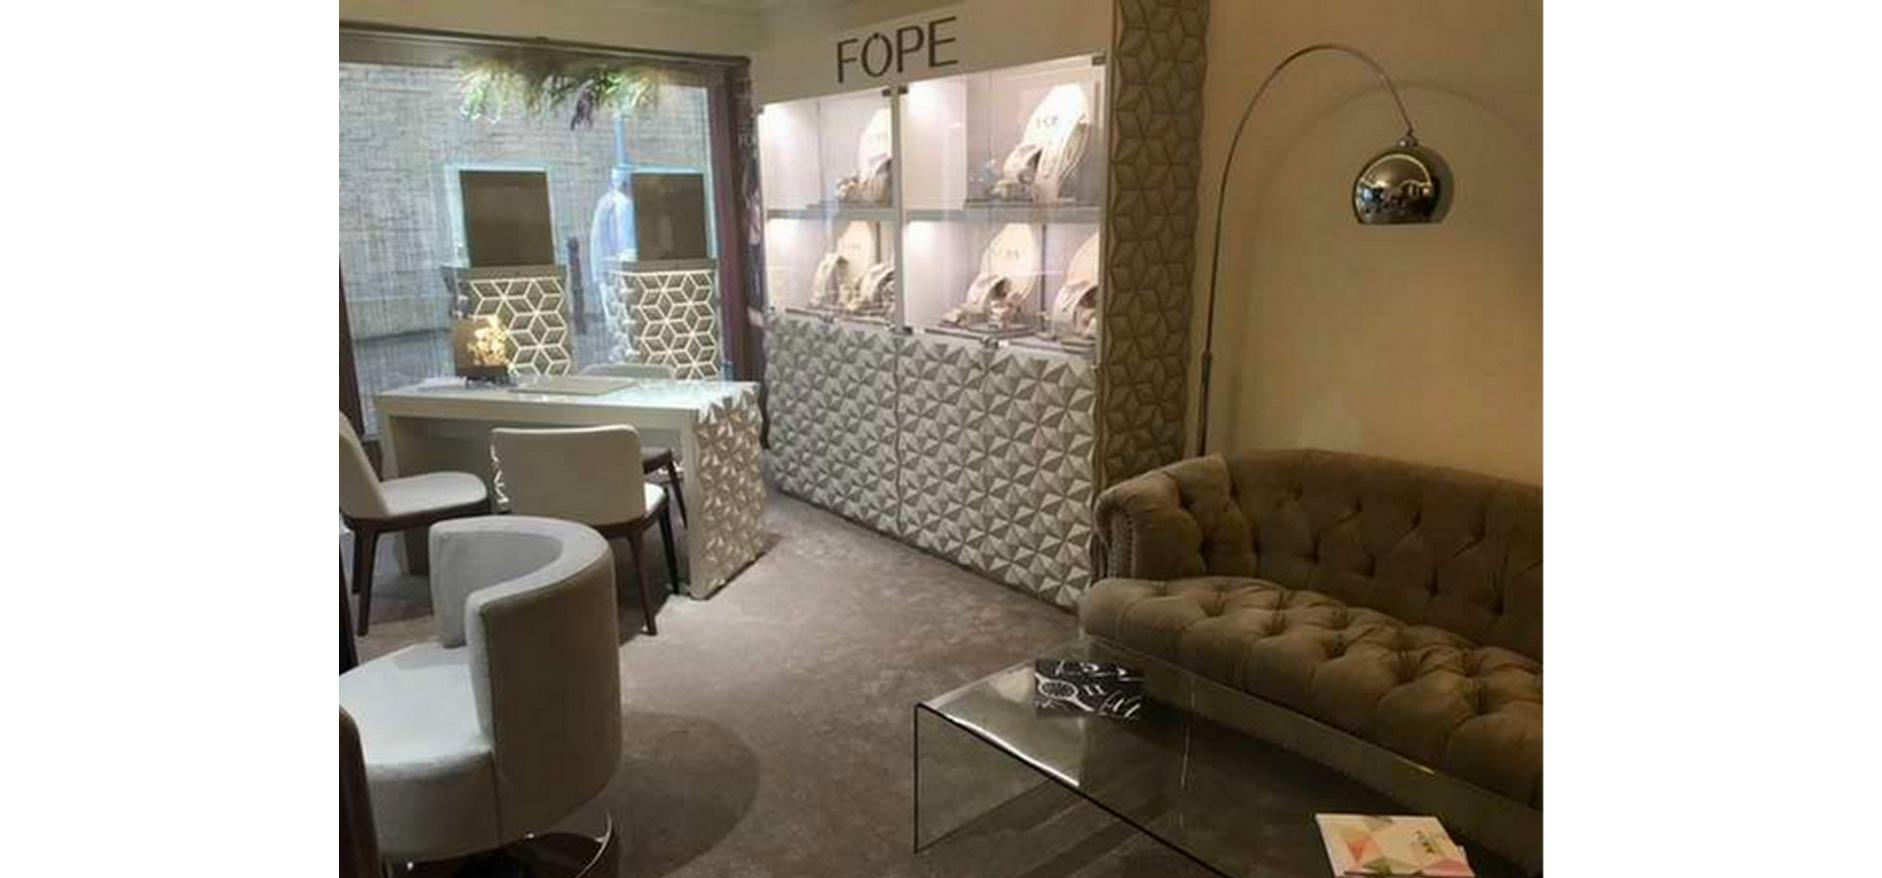 FOPE store display visual merchandising